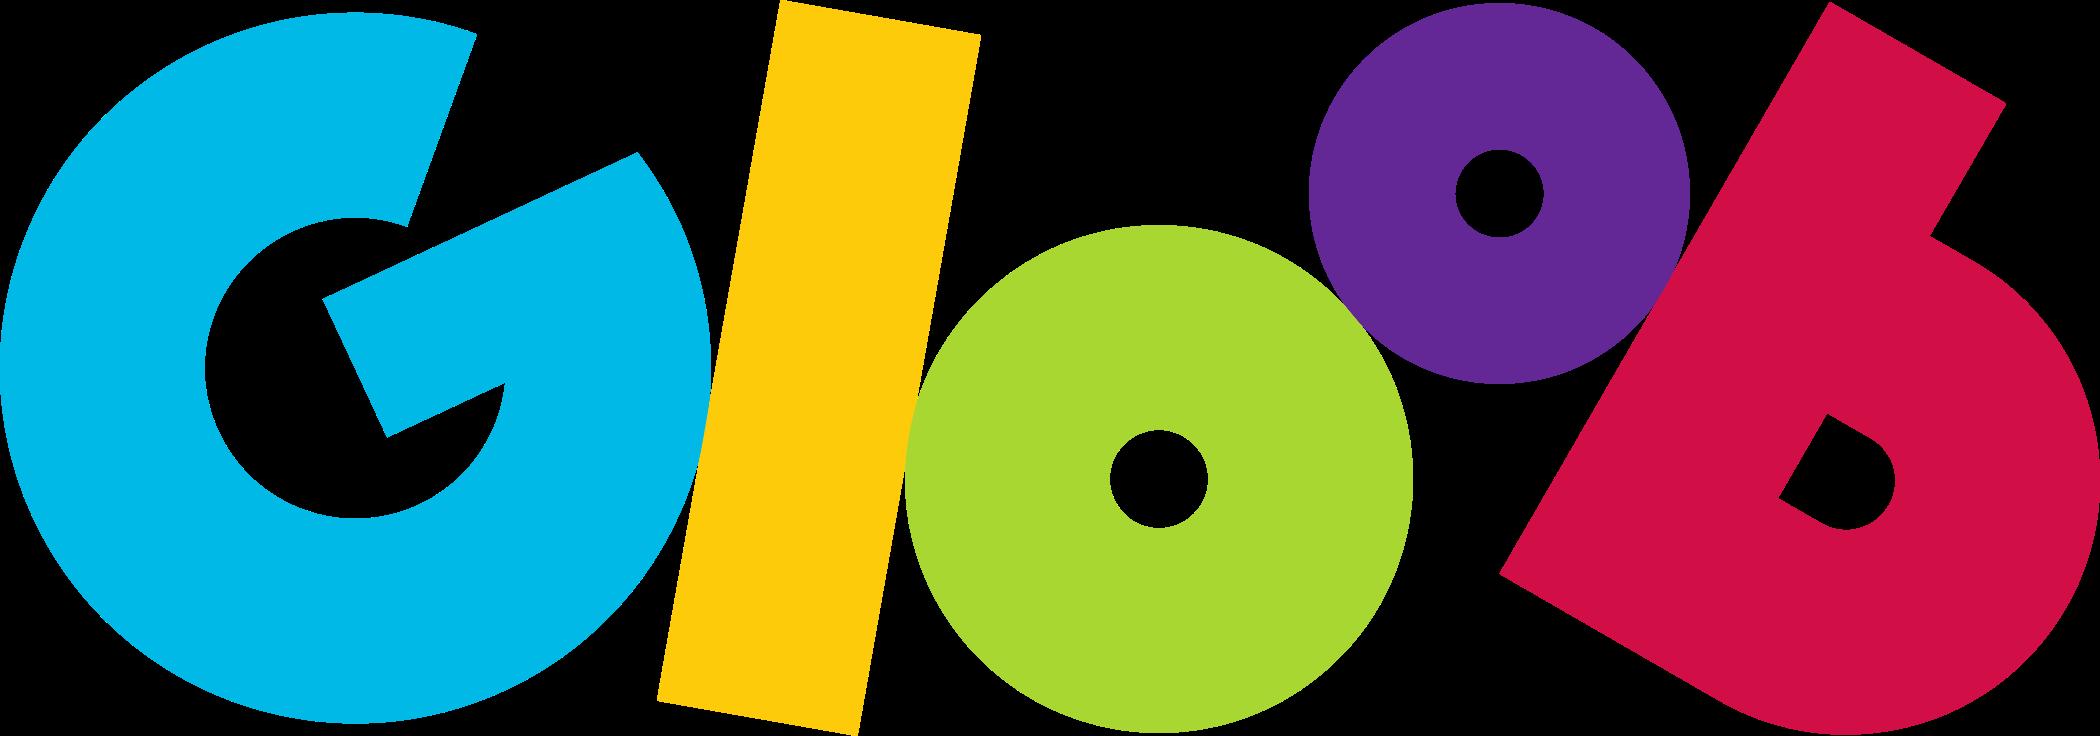 gloob logo 3 - Canal Gloob Logo